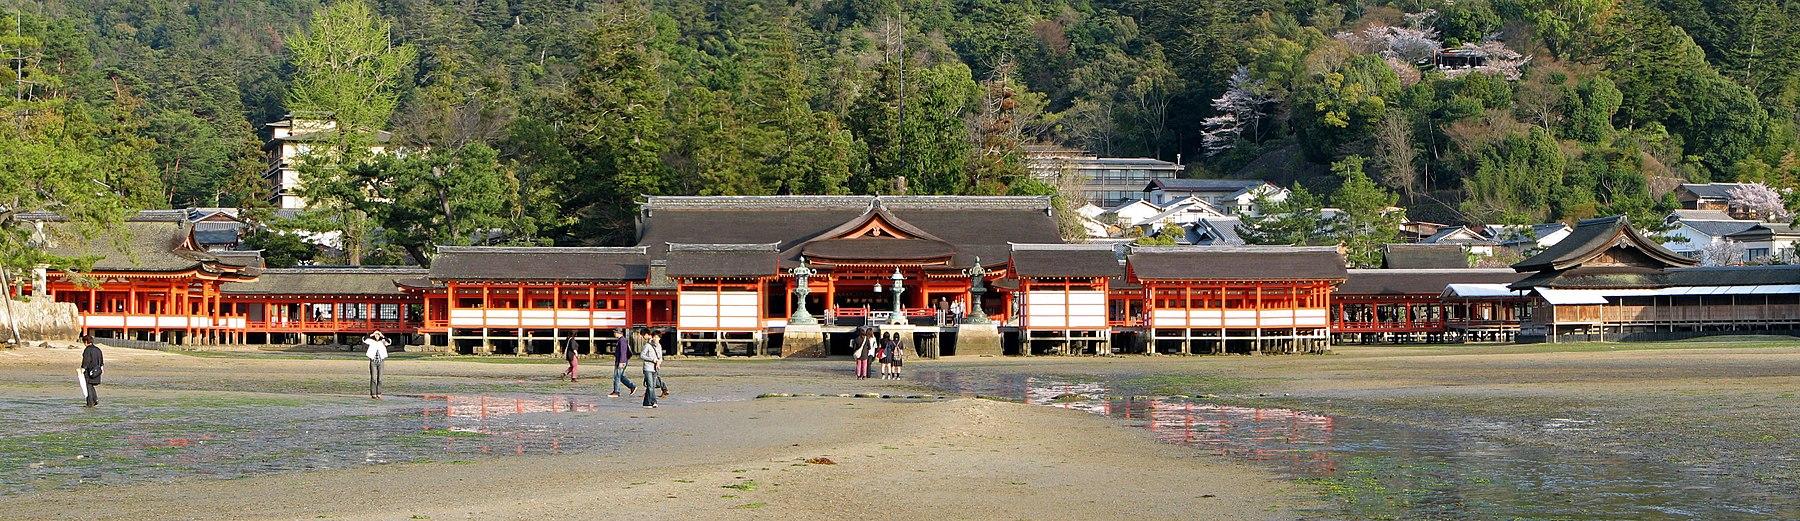 Itsukushima Shinto Shrine.jpg